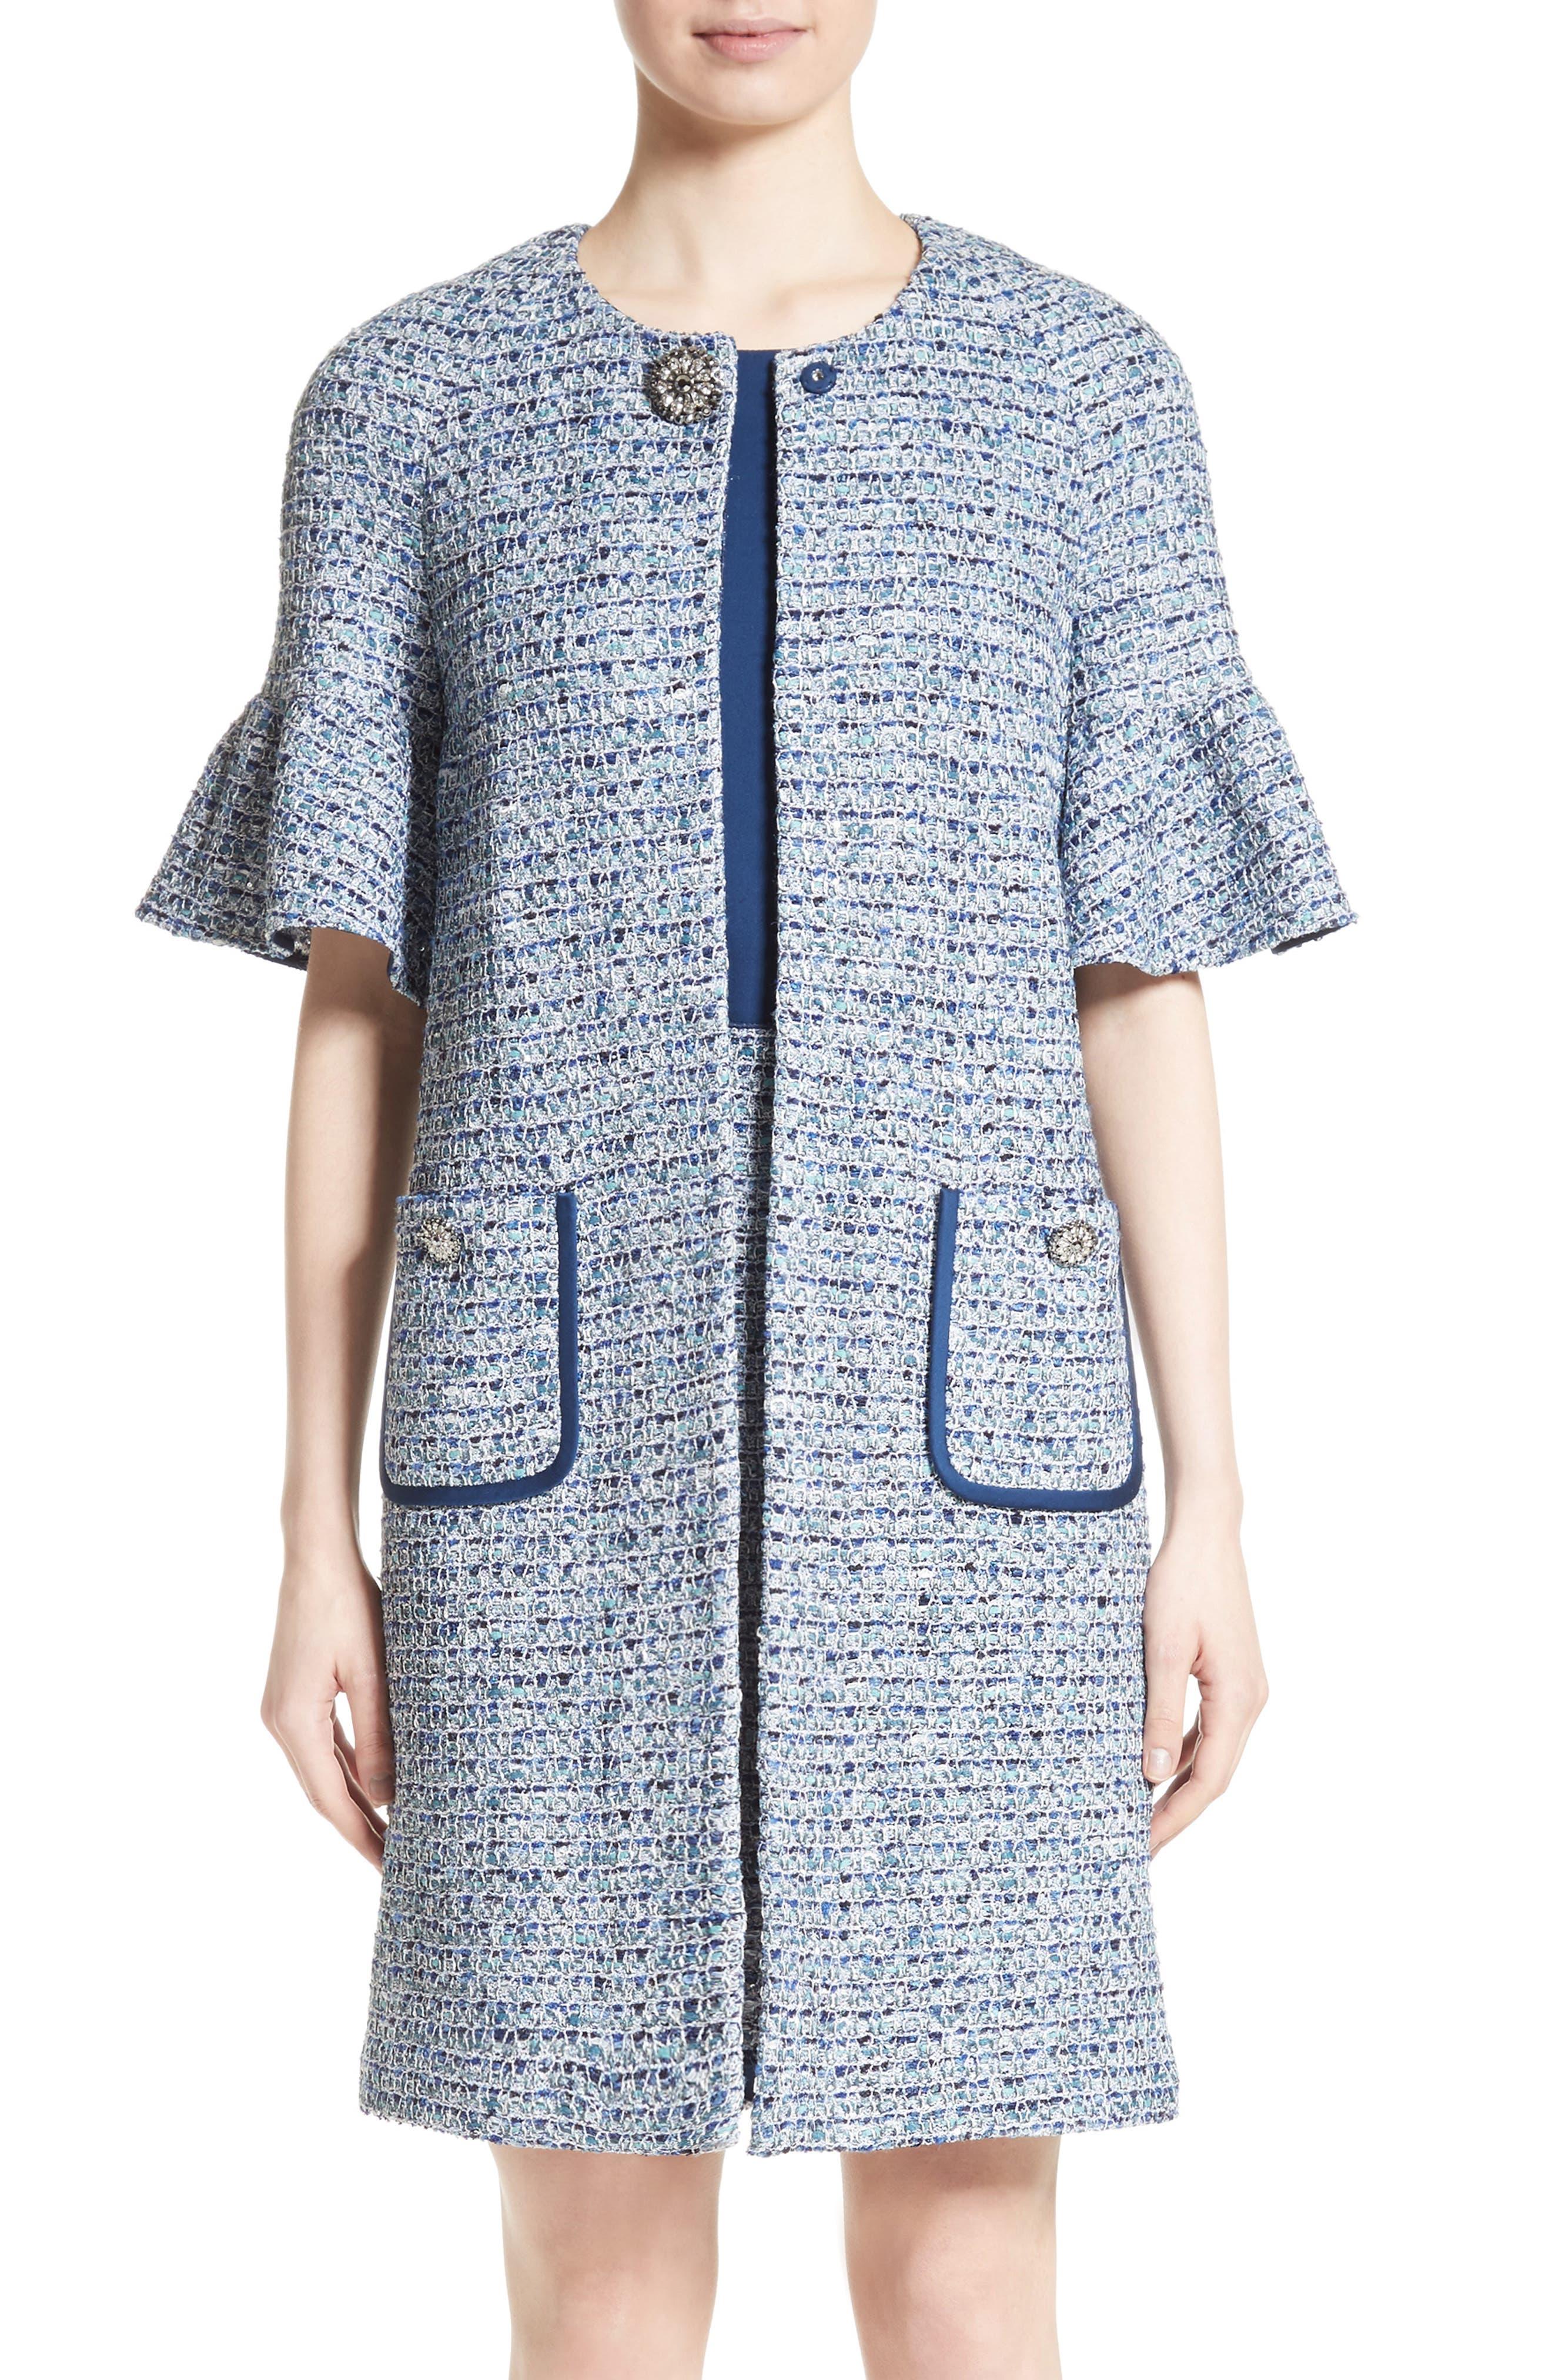 Main Image - St. John Collection Kiara Tweed Bell Sleeve Jacket